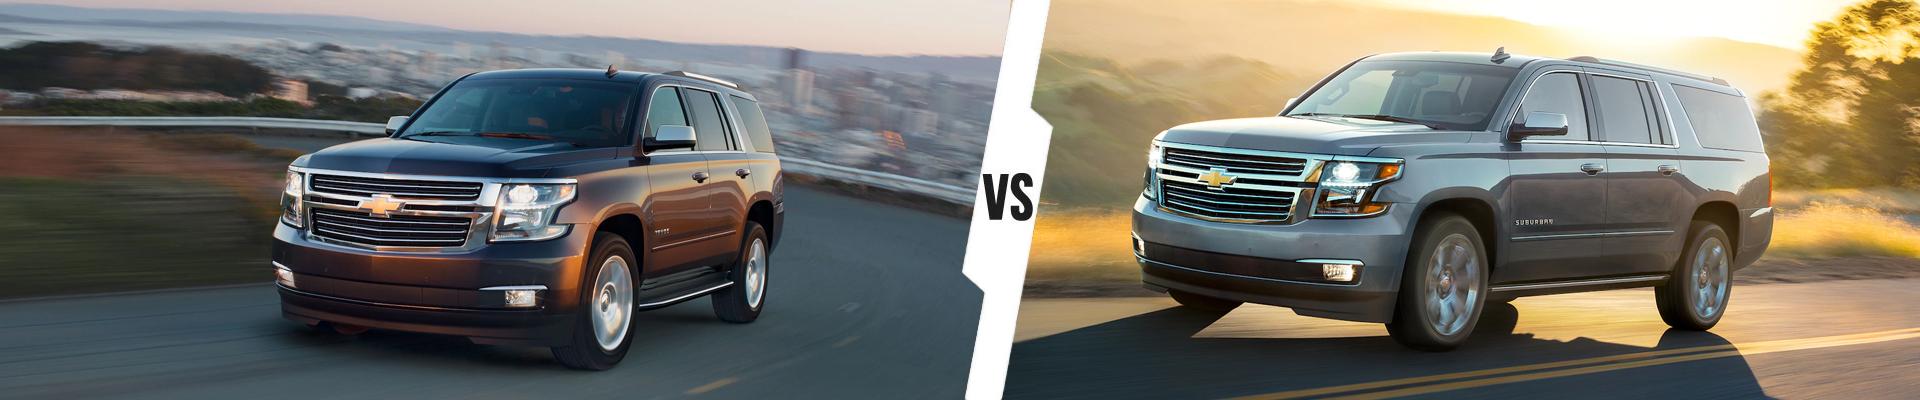 Chevrolet SUV Comparison: 2020 Chevrolet Tahoe Versus 2020 Chevrolet Suburban